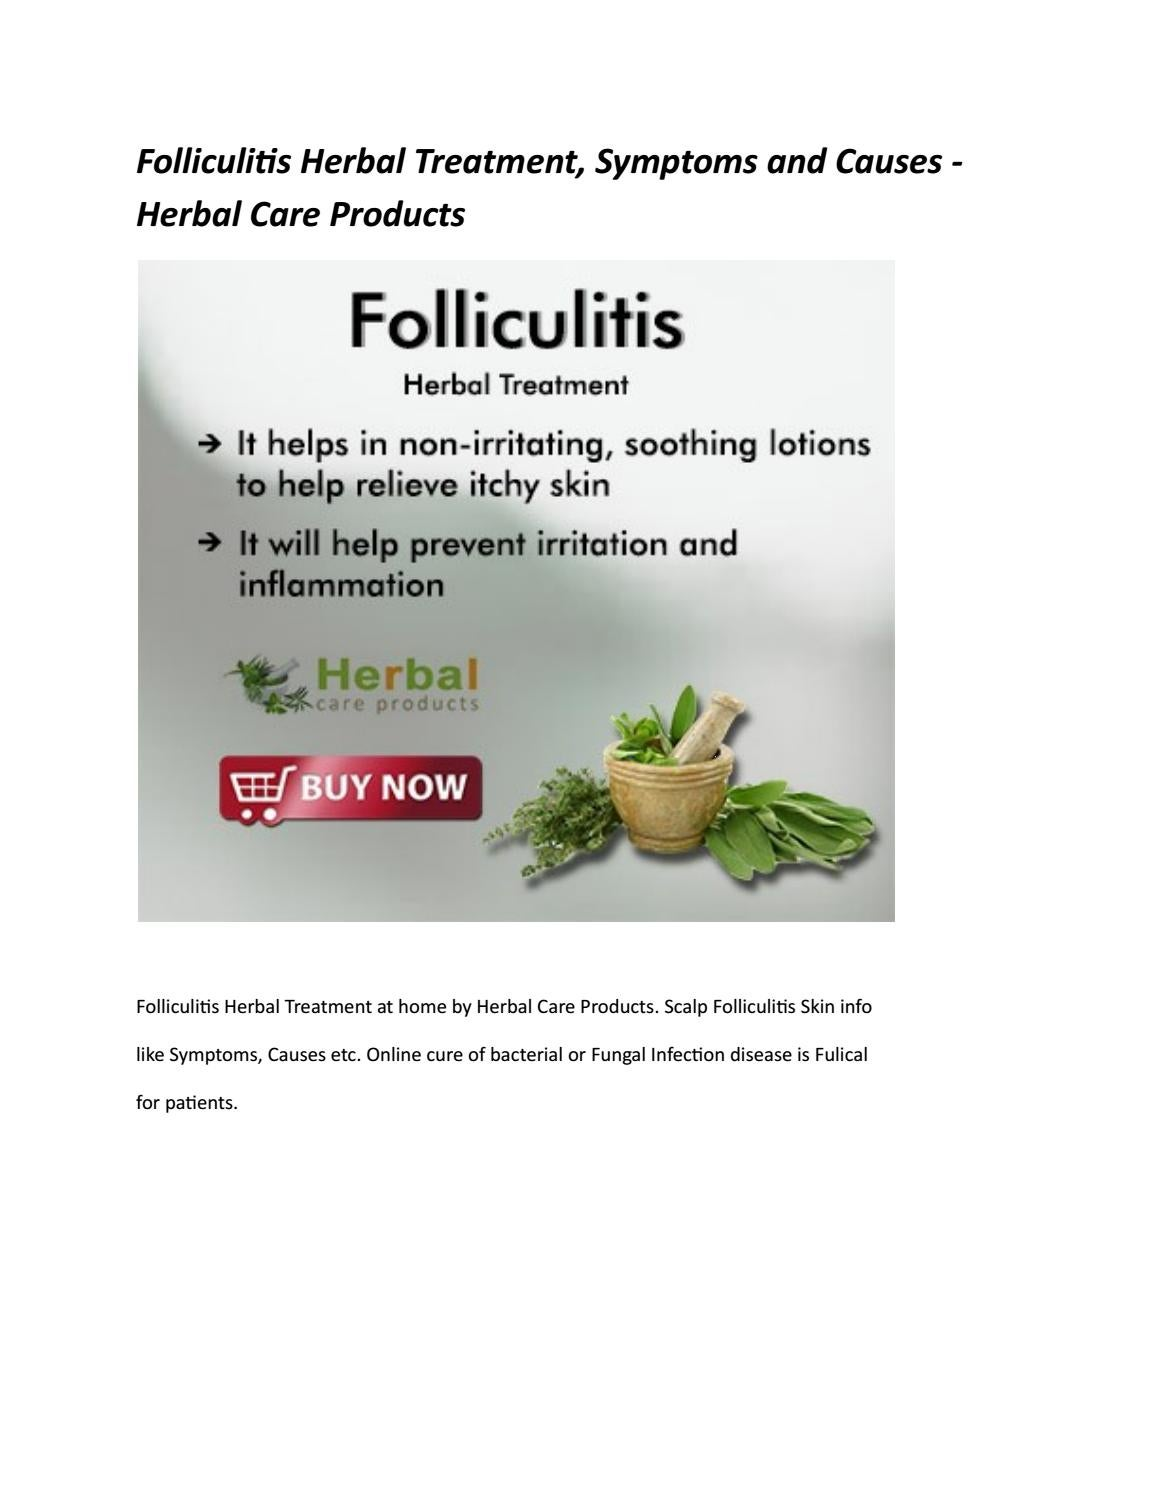 Folliculitis Herbal Treatment, Symptoms and Causes - Herbal